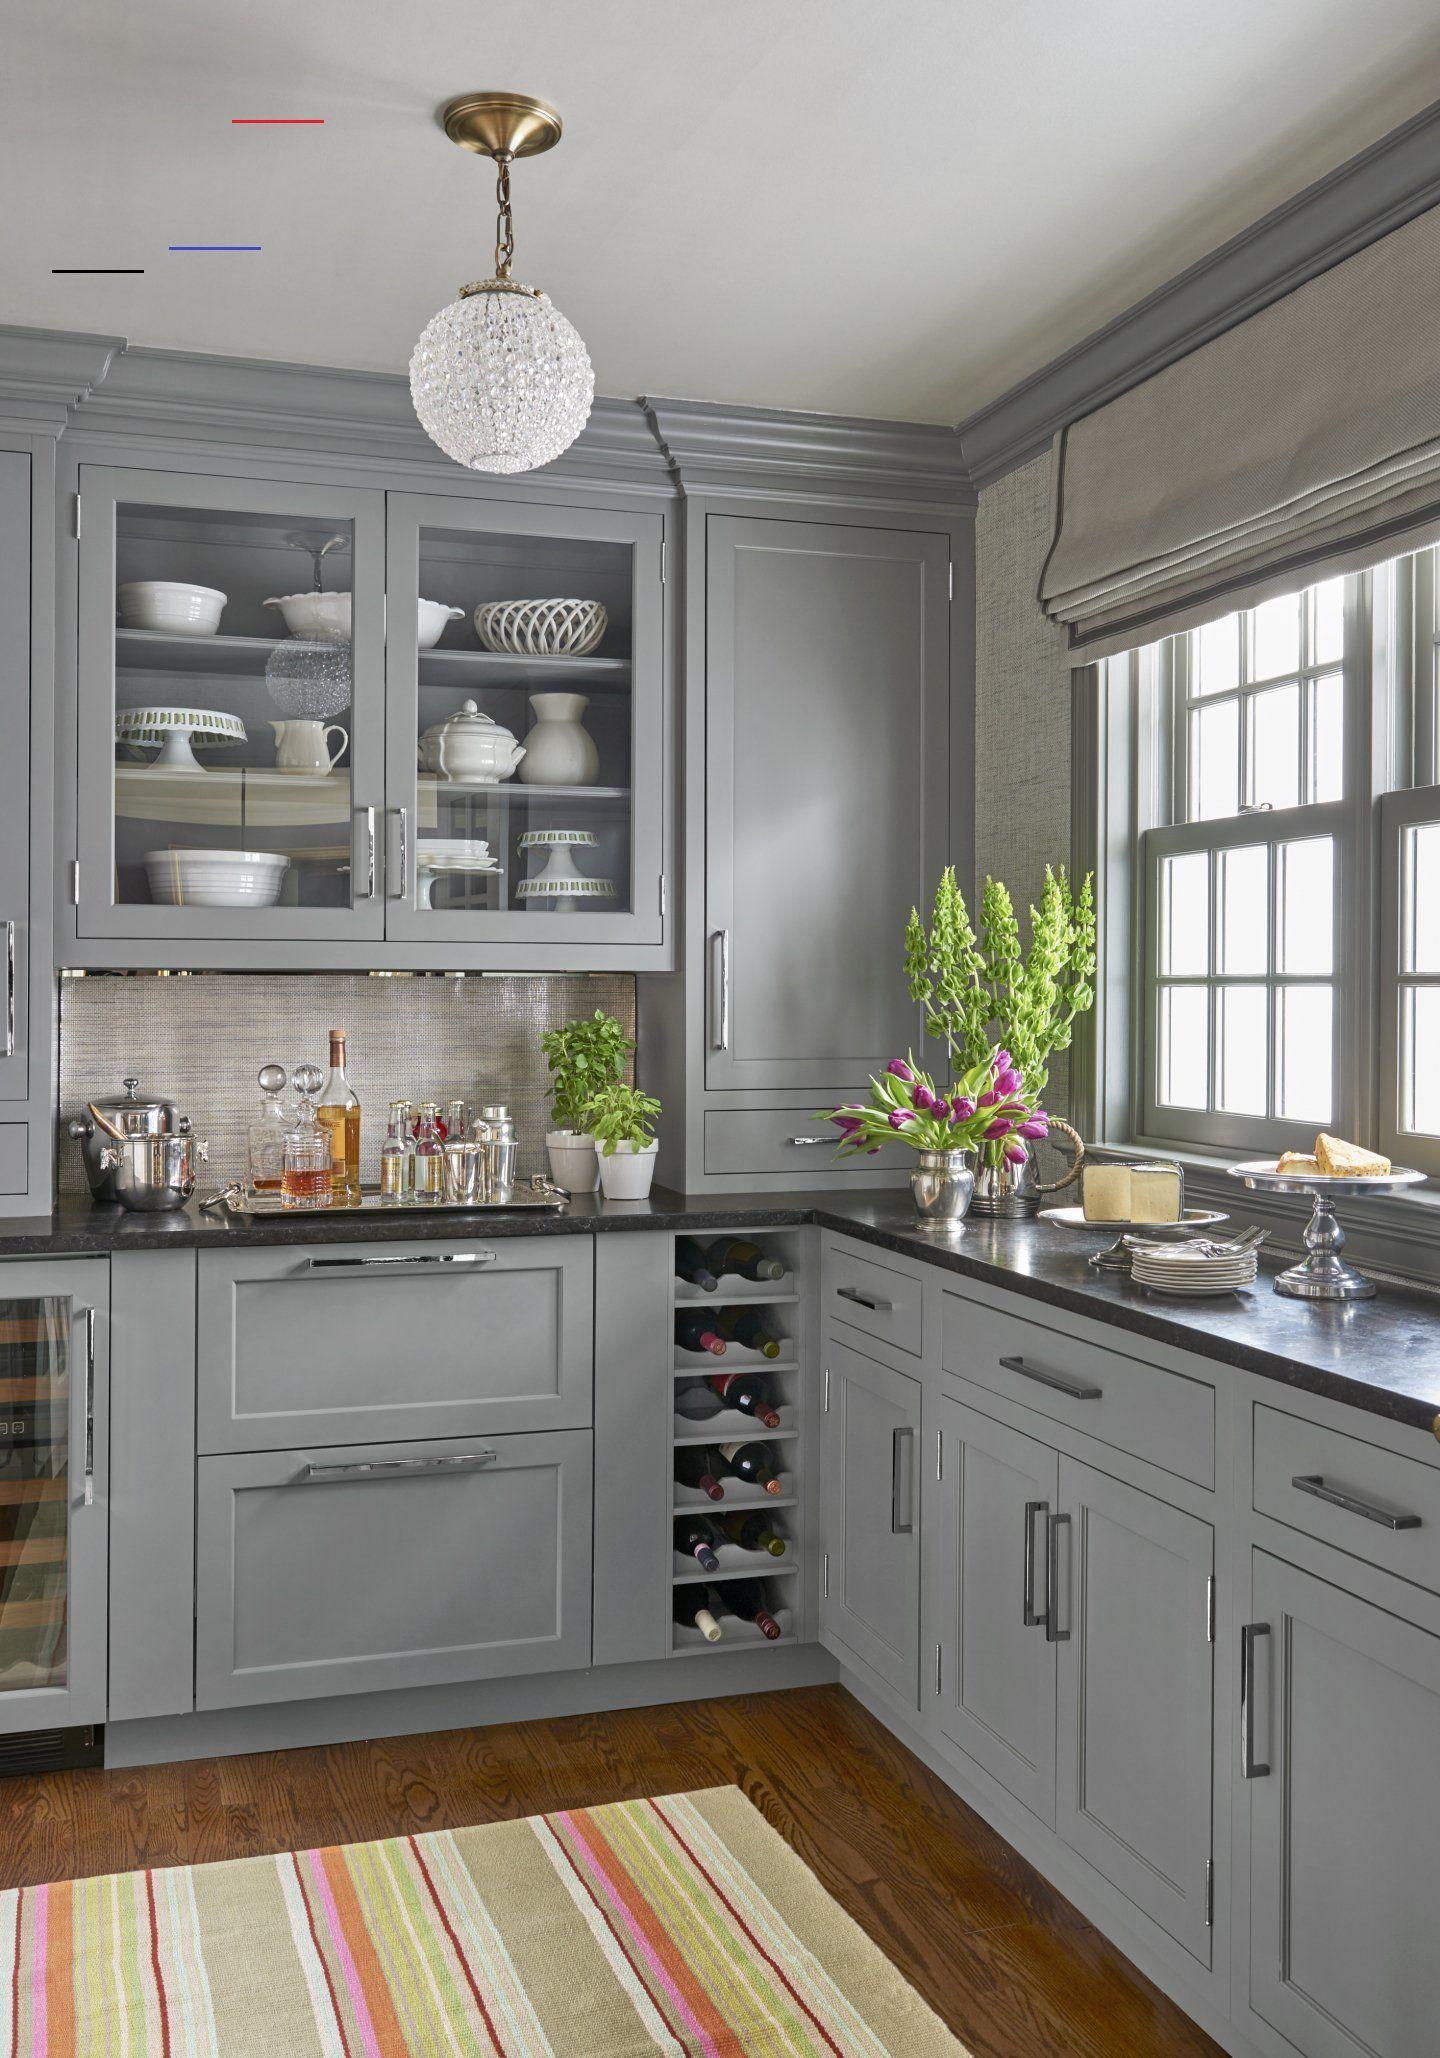 Graycabinets In 2020 Keuken Grijze Keukens Keuken Ideeen